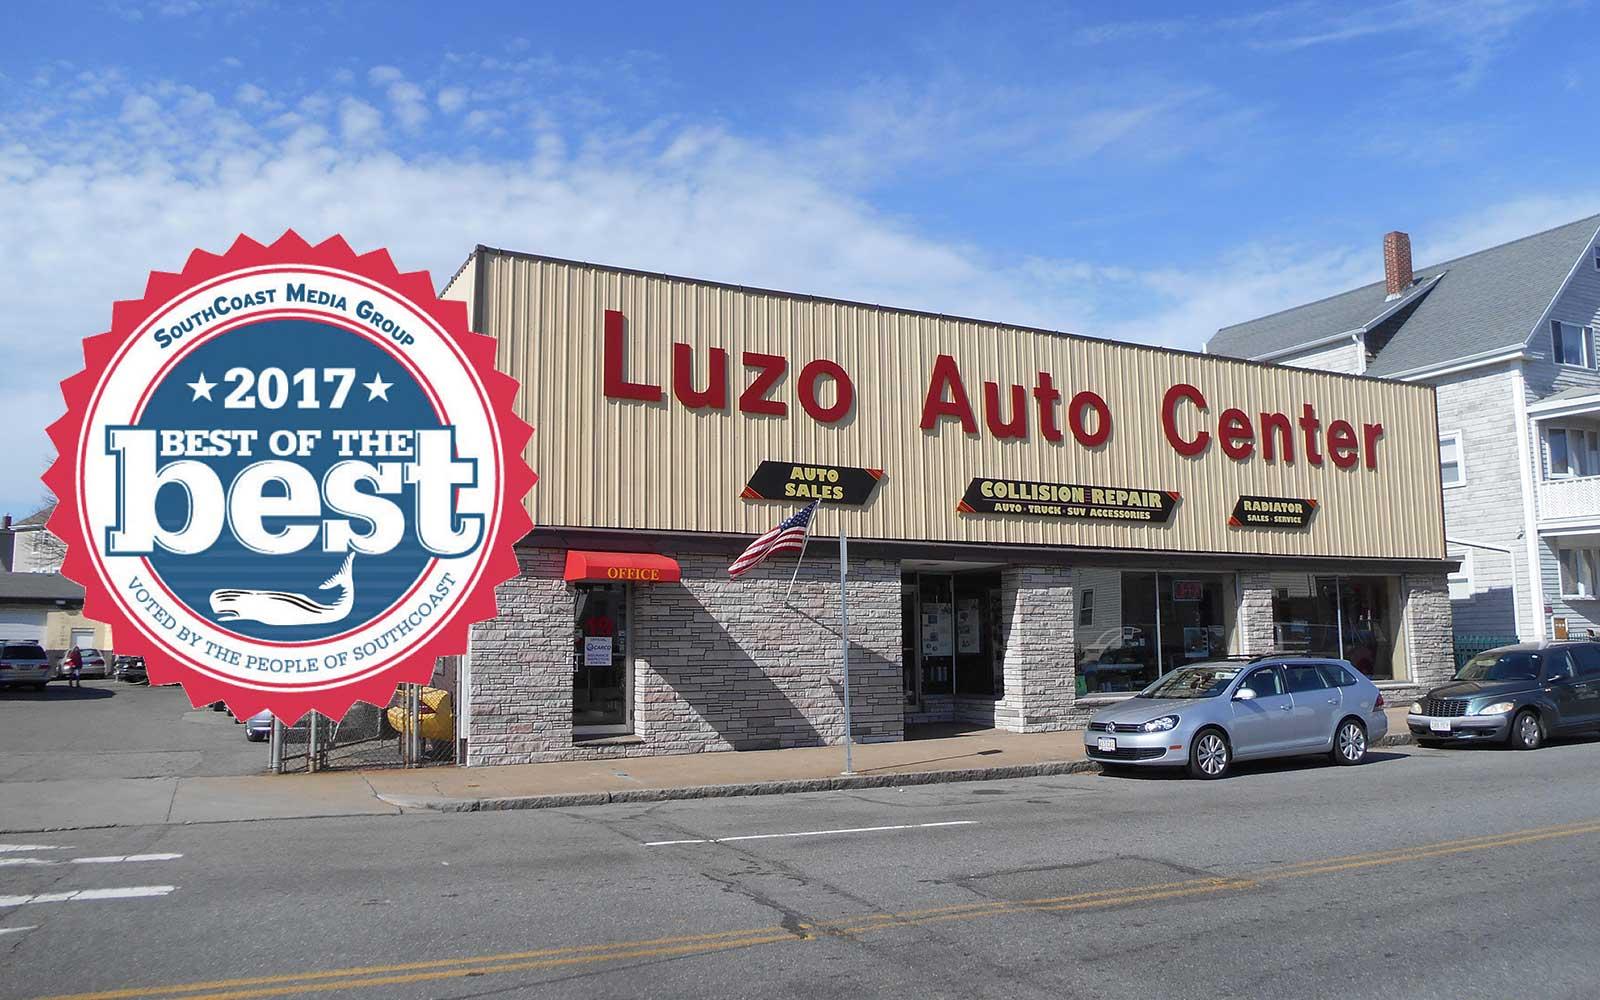 luzoautocenter-best2017